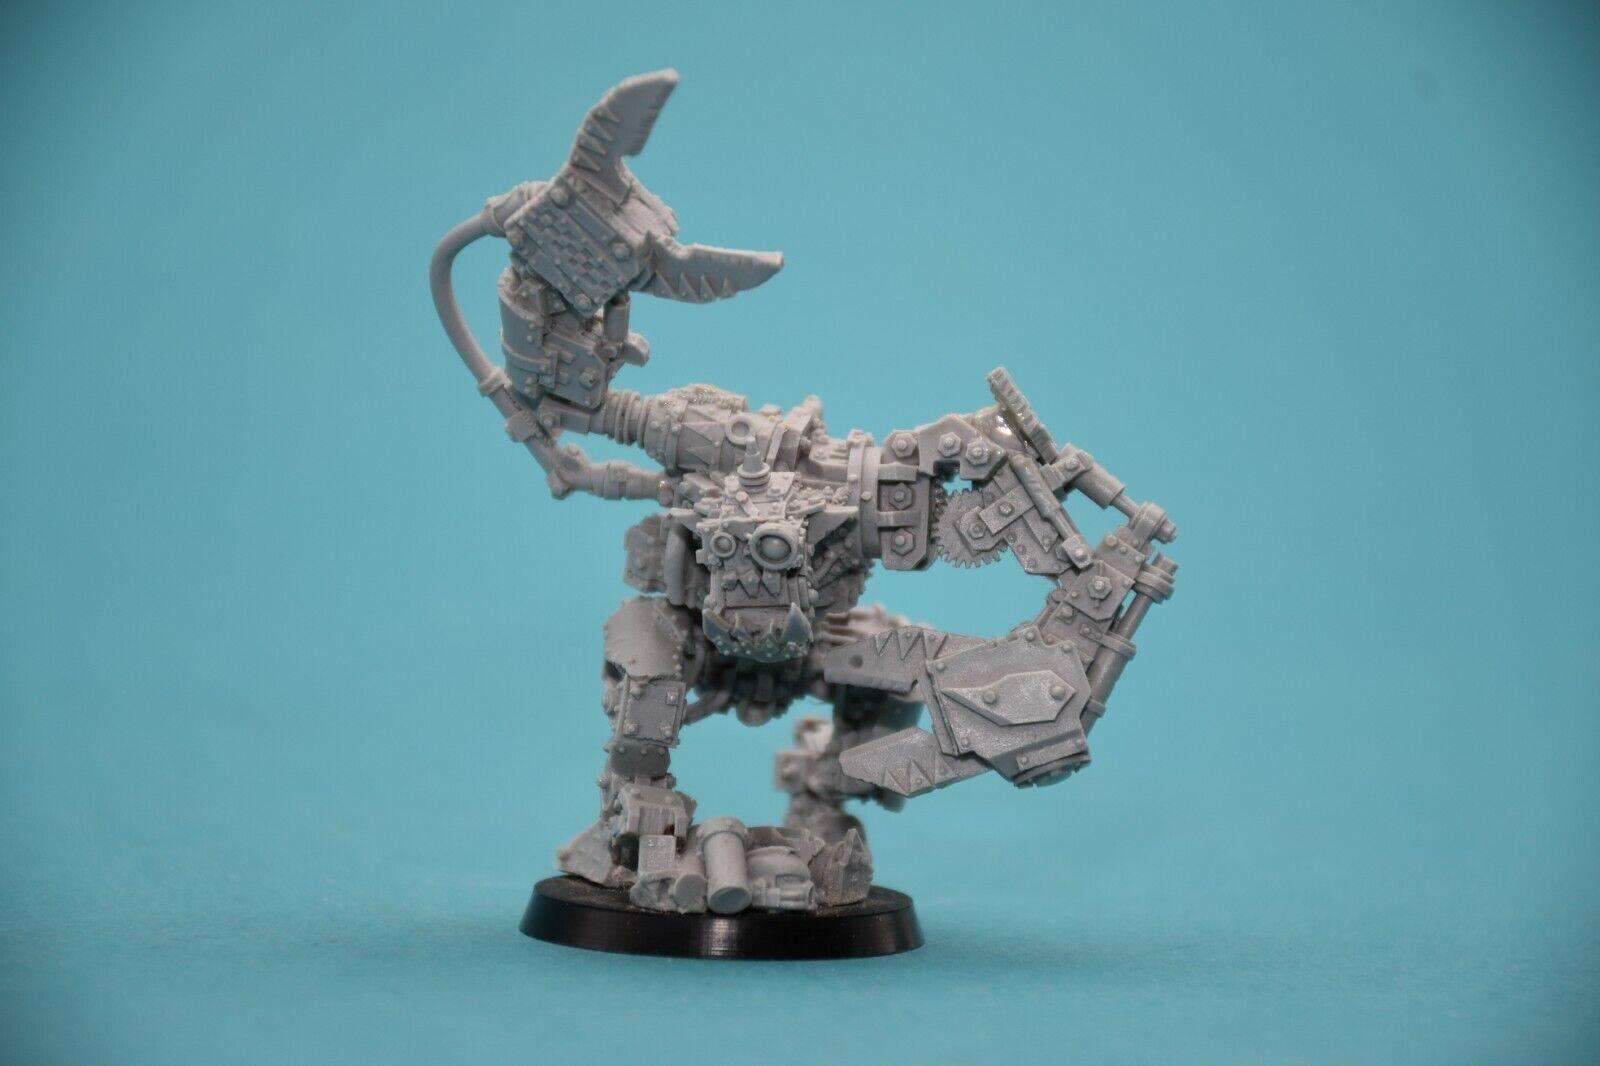 Warhammer 40k Ork Runtbot and Grot